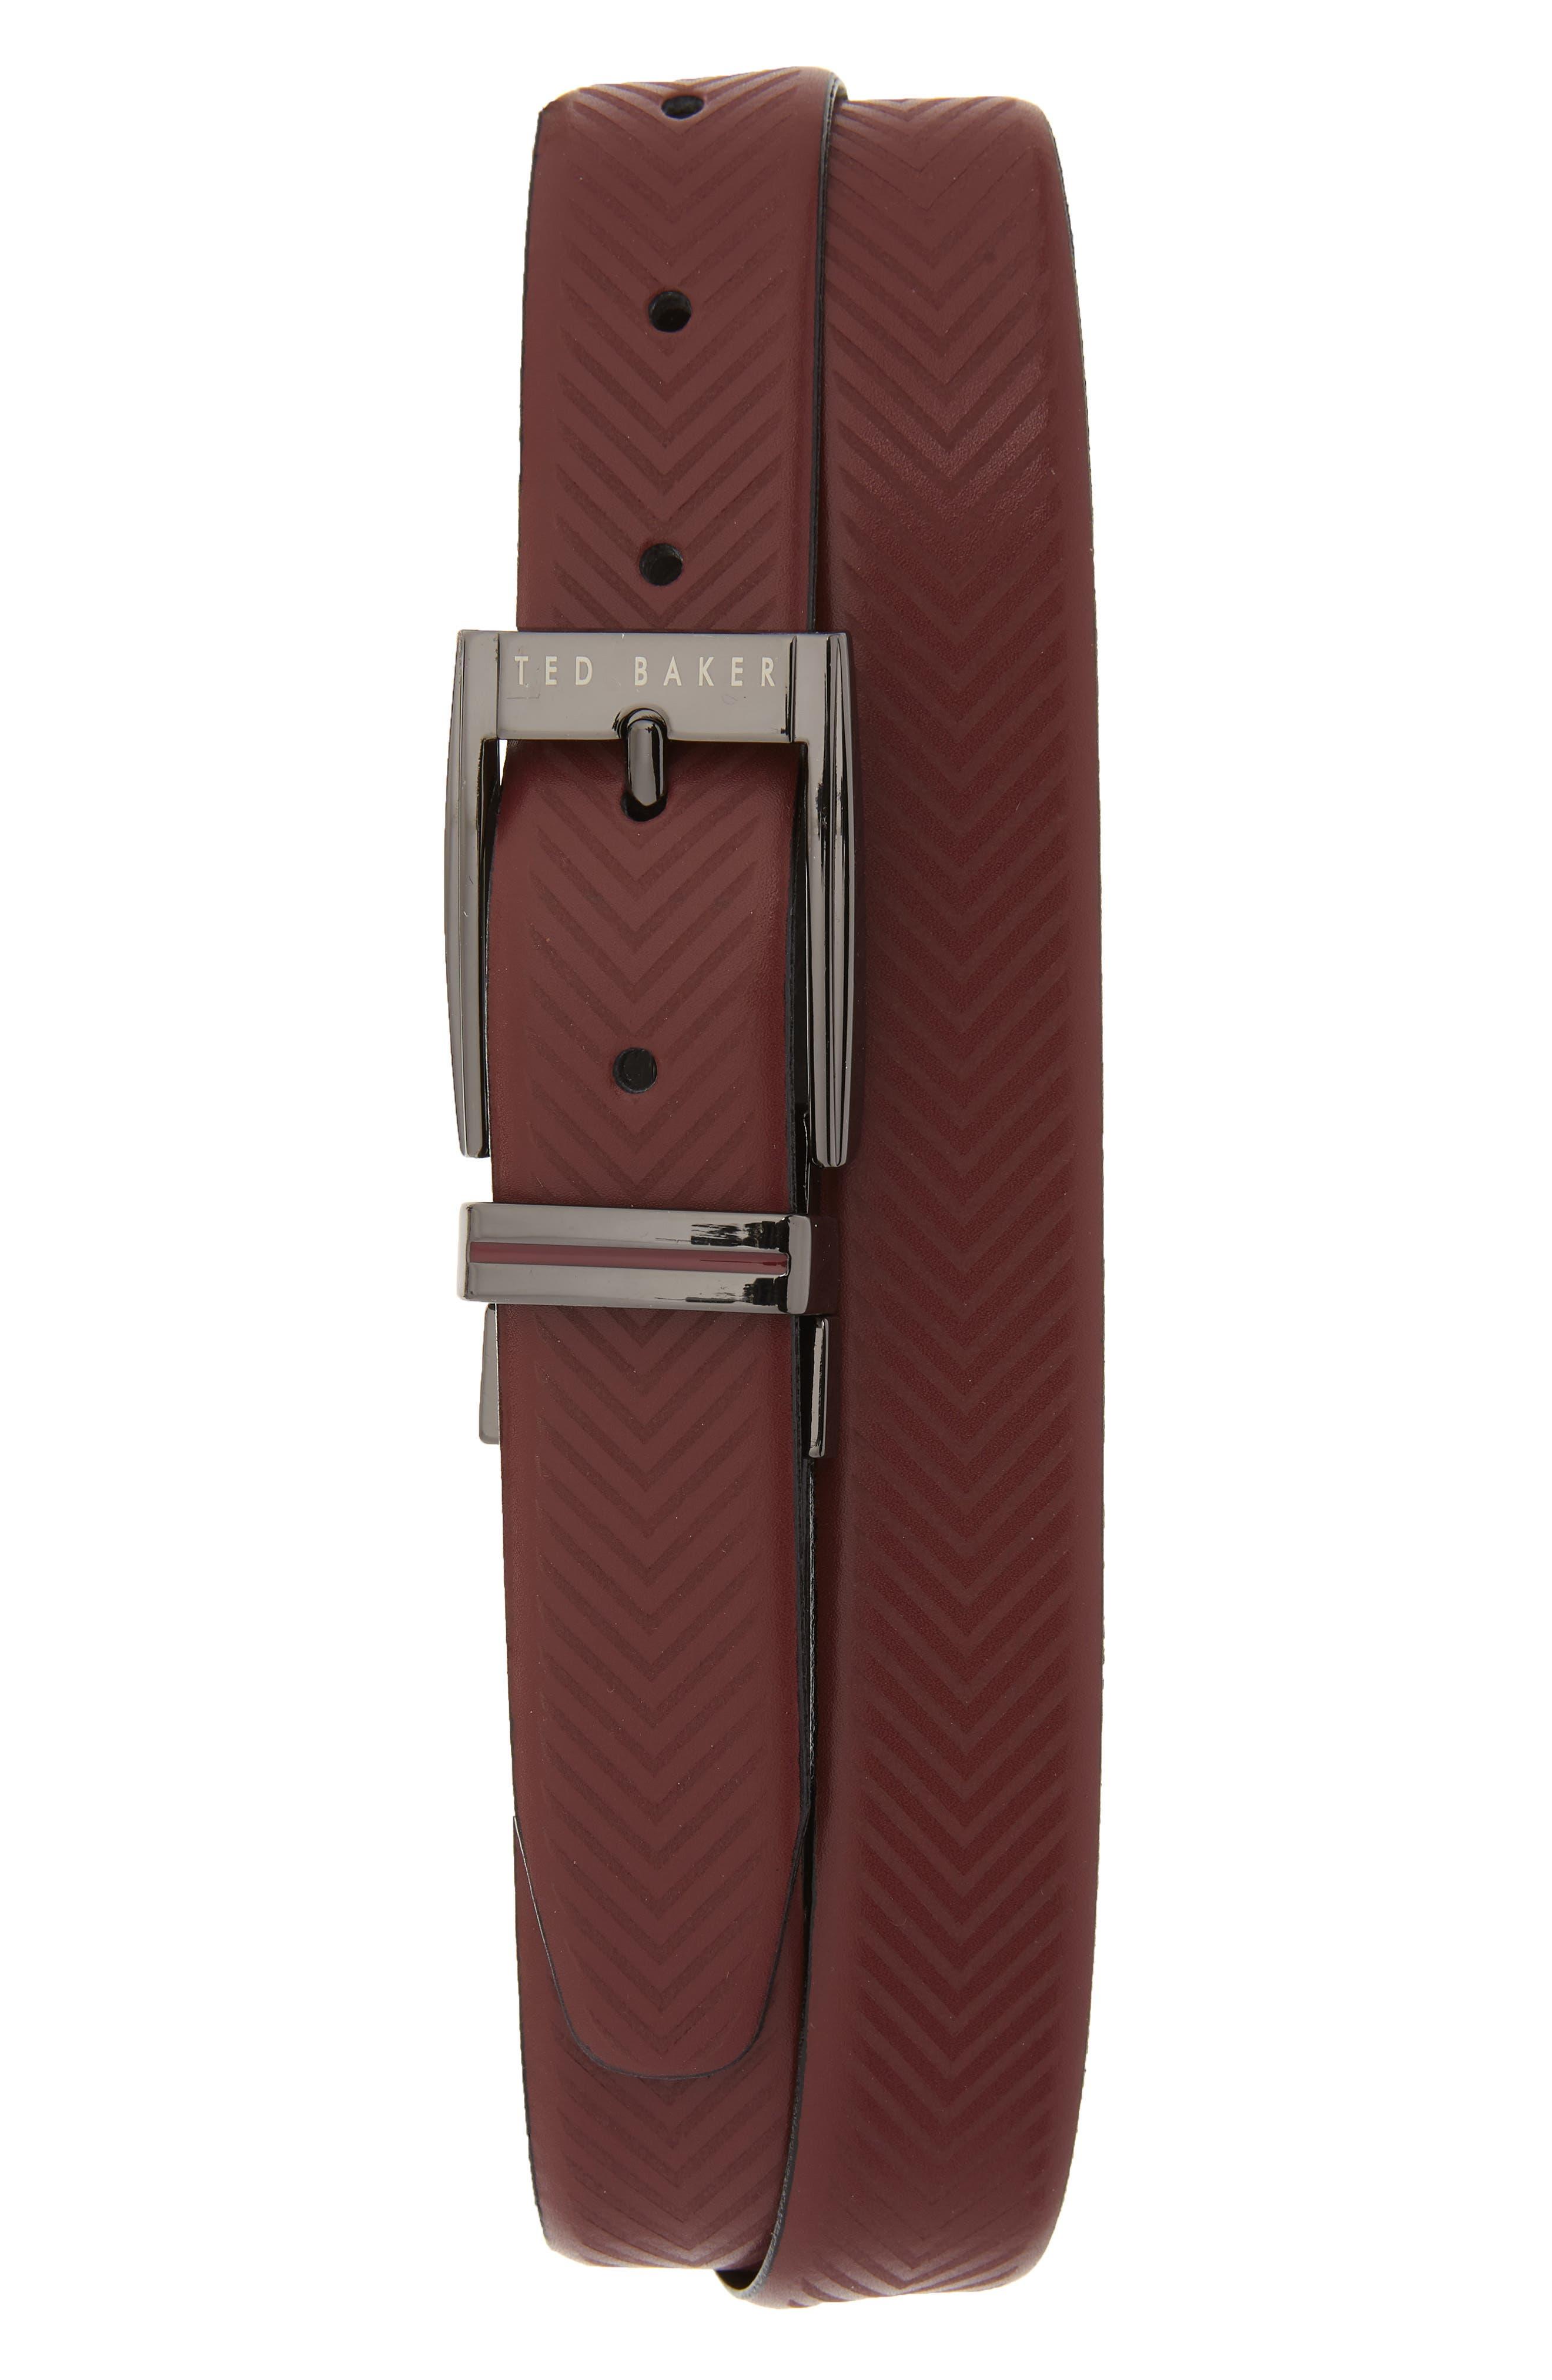 Ted Baker London Herringbone Reversible Belt, Chocolate